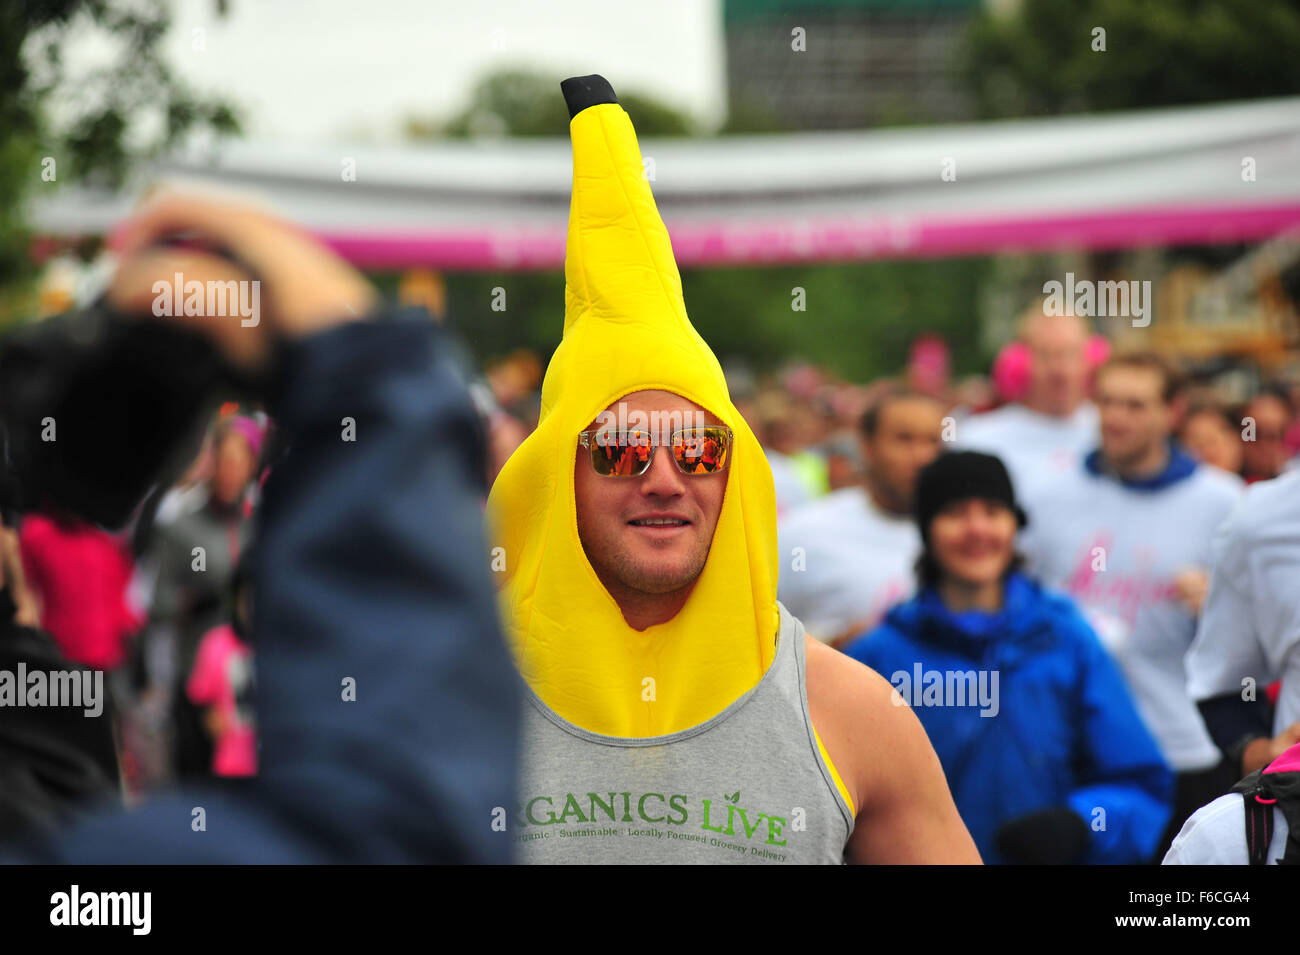 A Man Wears A Yellow Banana Hat As He Participates In The Annua Run